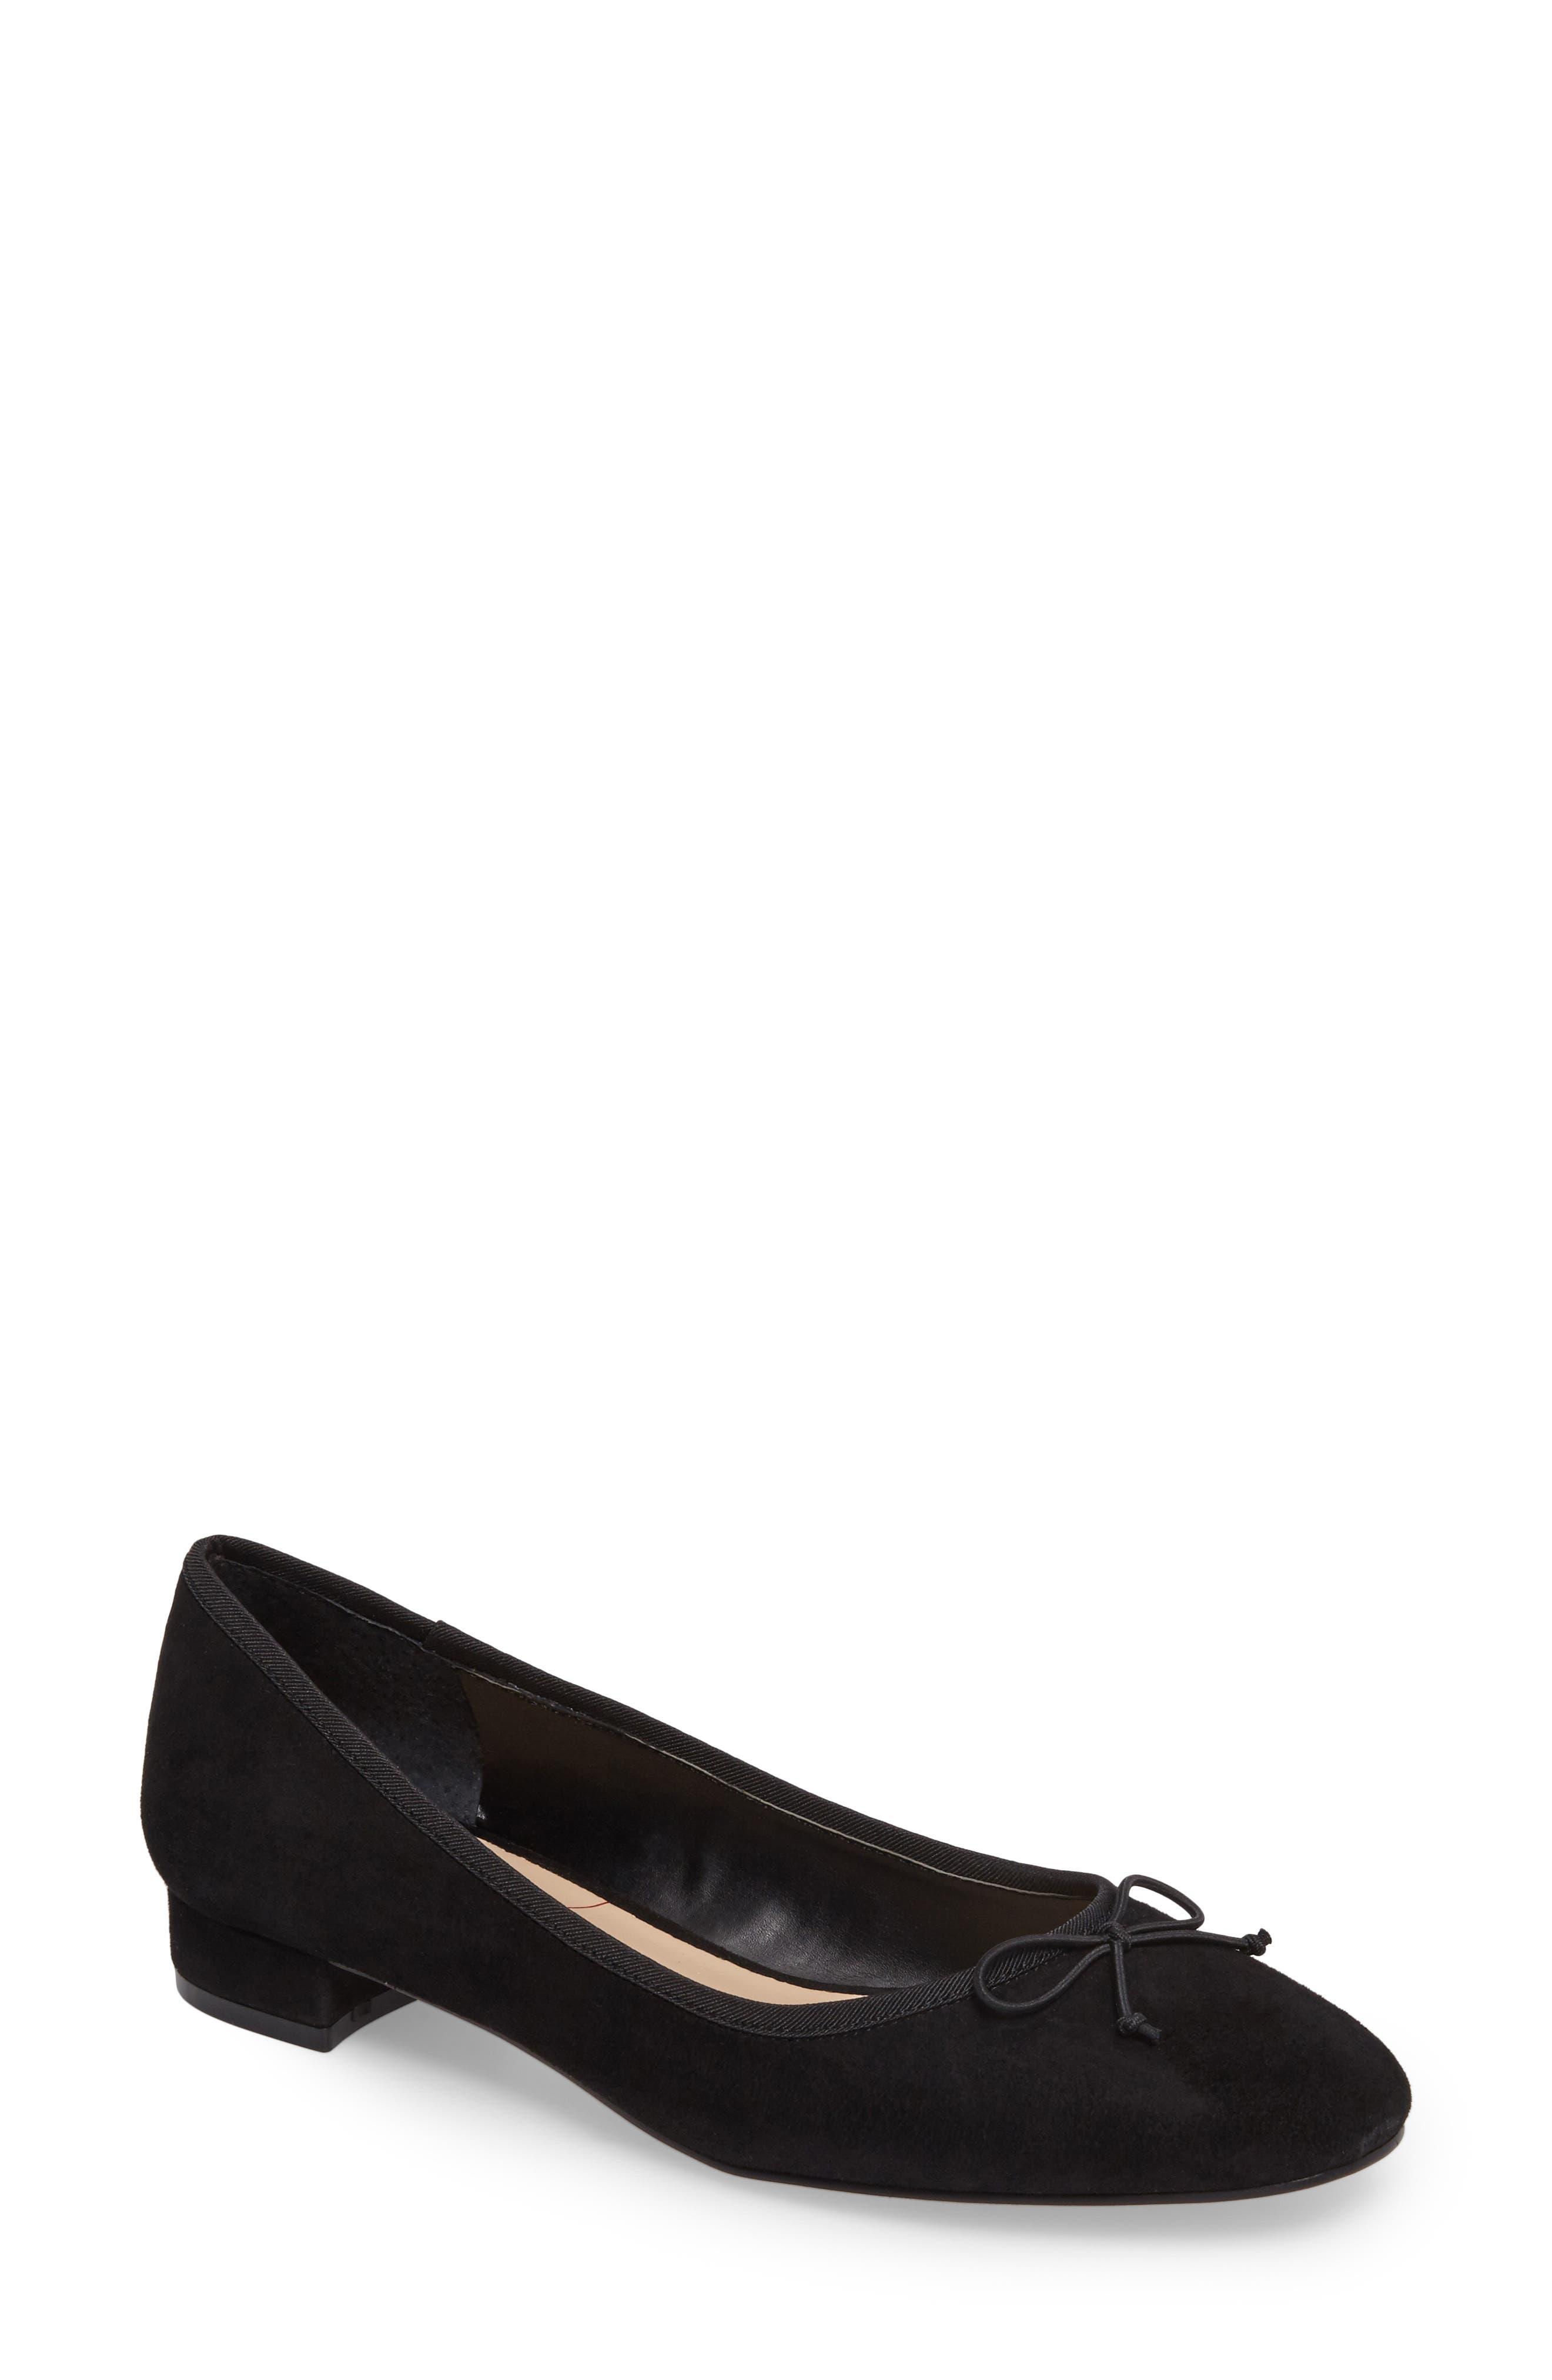 Anastasi Block Heel Flat,                             Main thumbnail 1, color,                             Black Suede